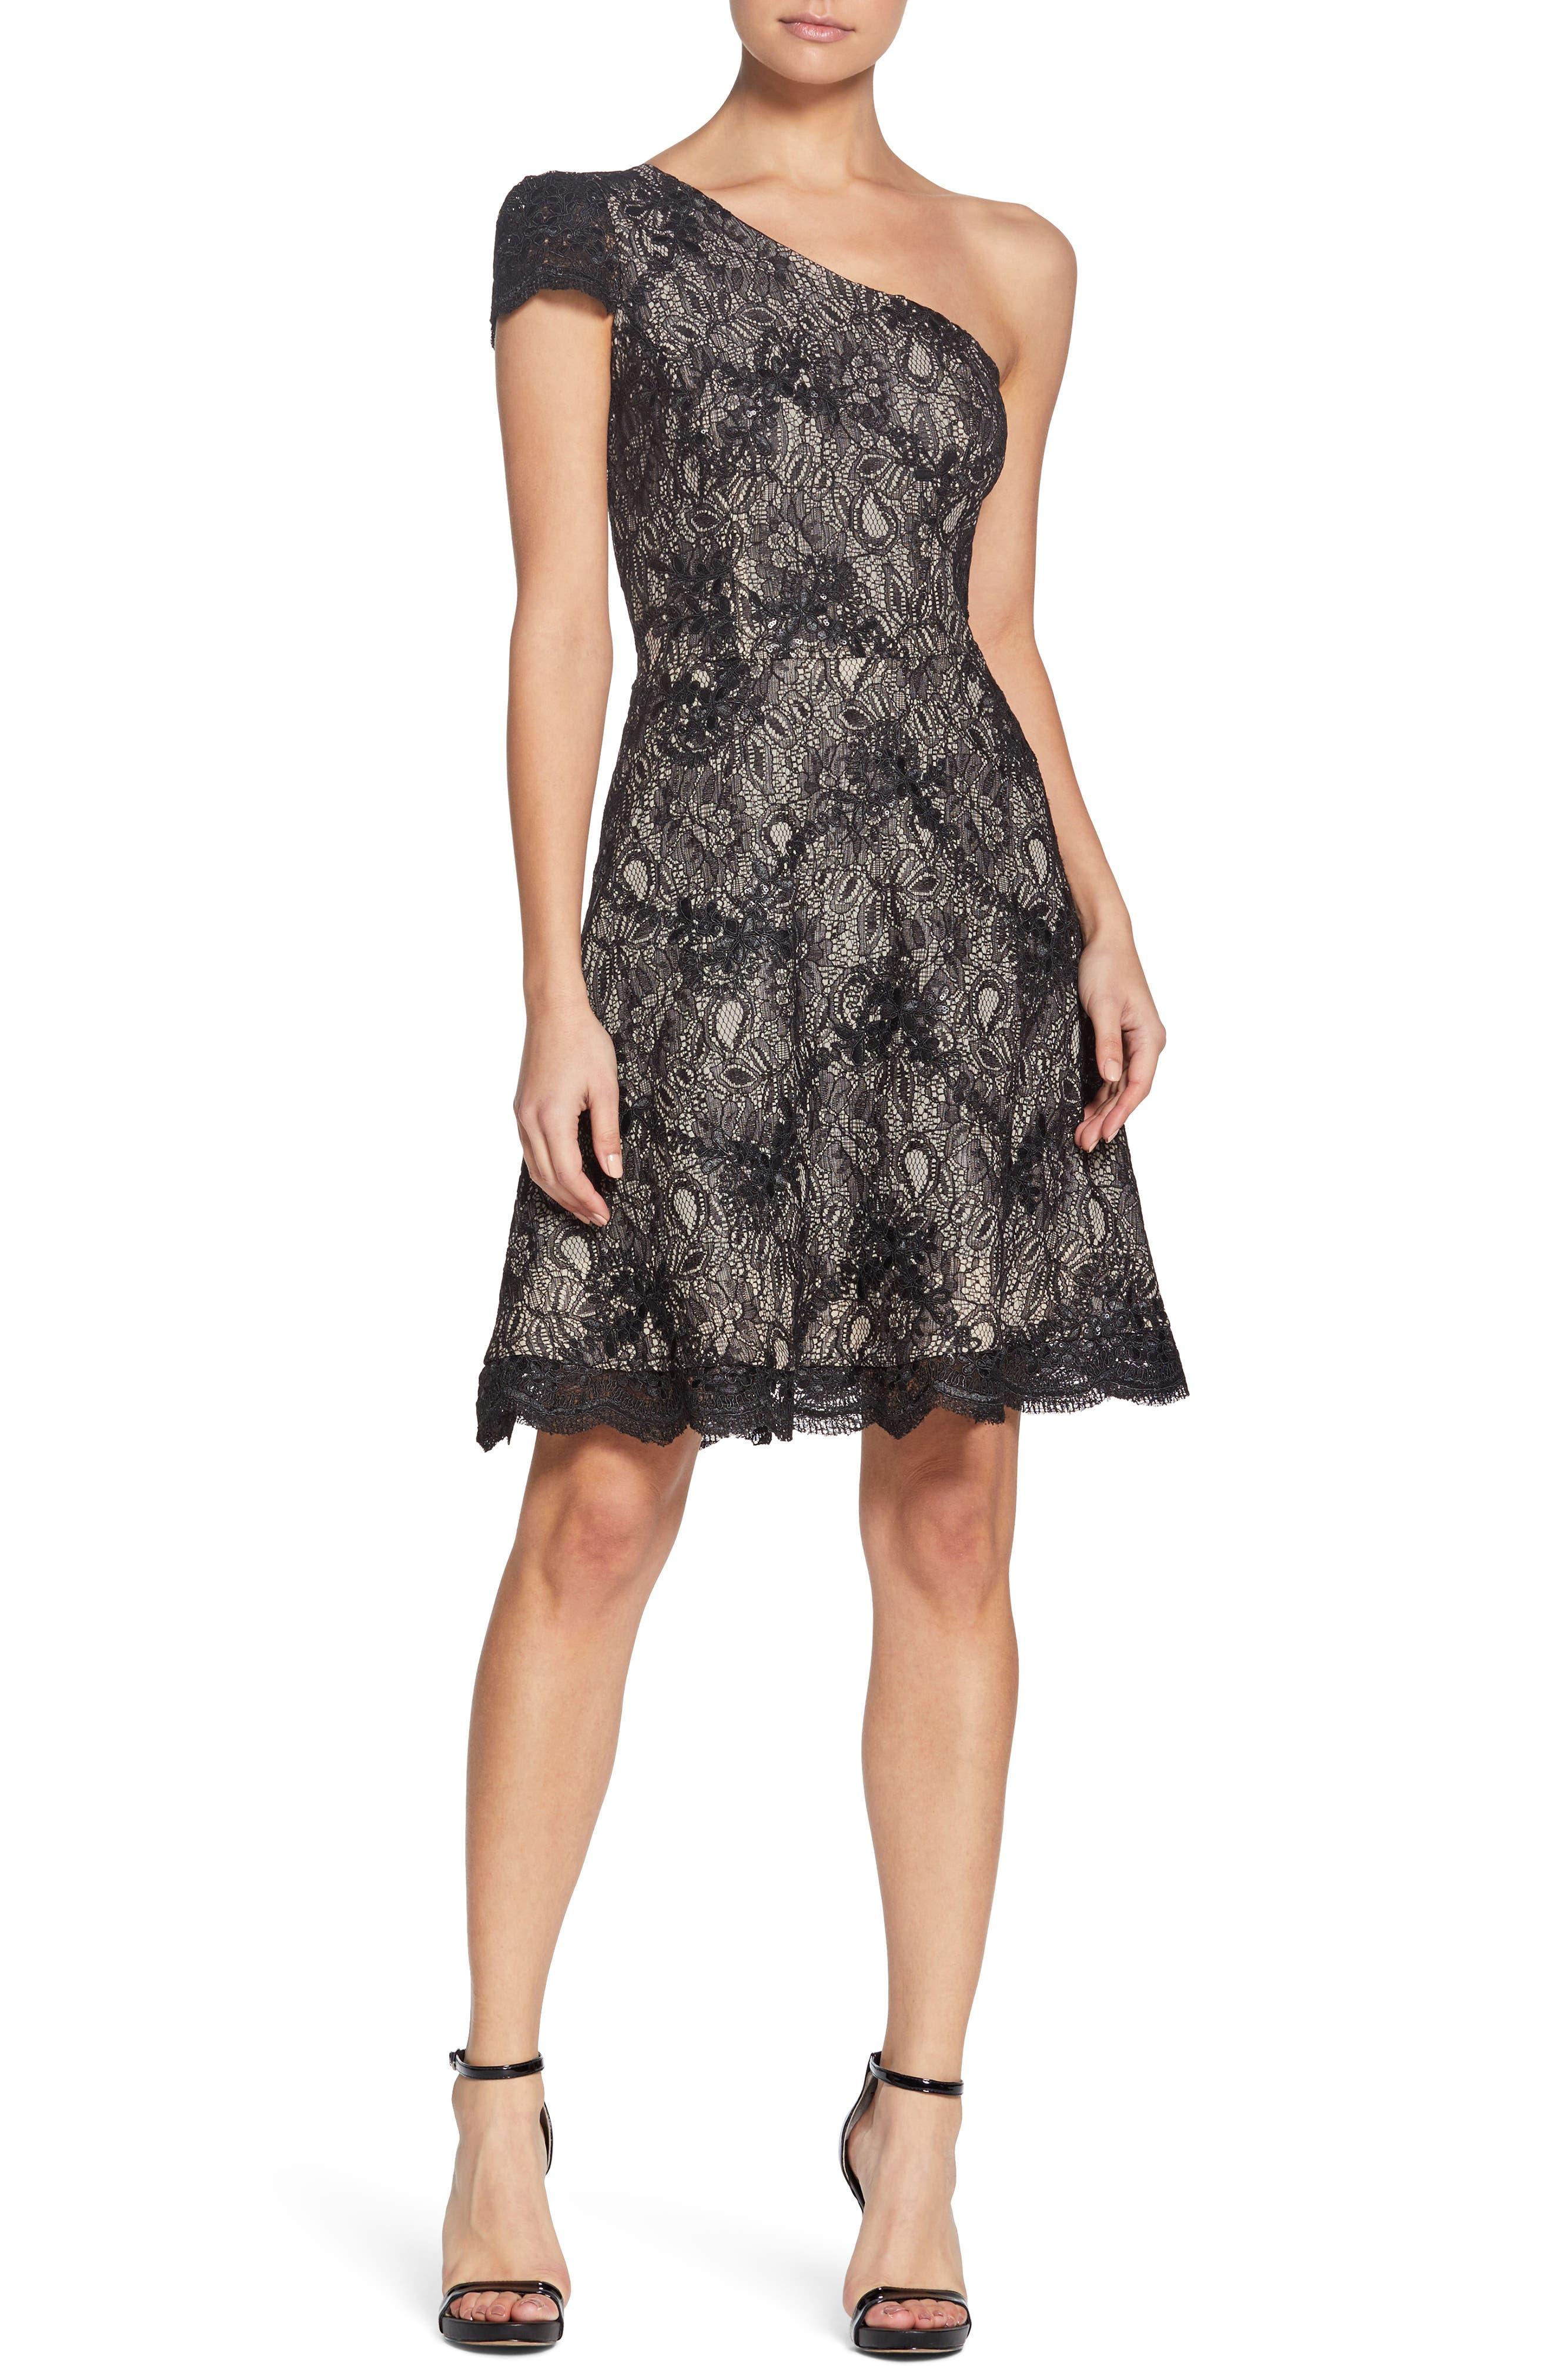 Alex One-Shoulder Cocktail Dress,                         Main,                         color, BLACK/ NUDE